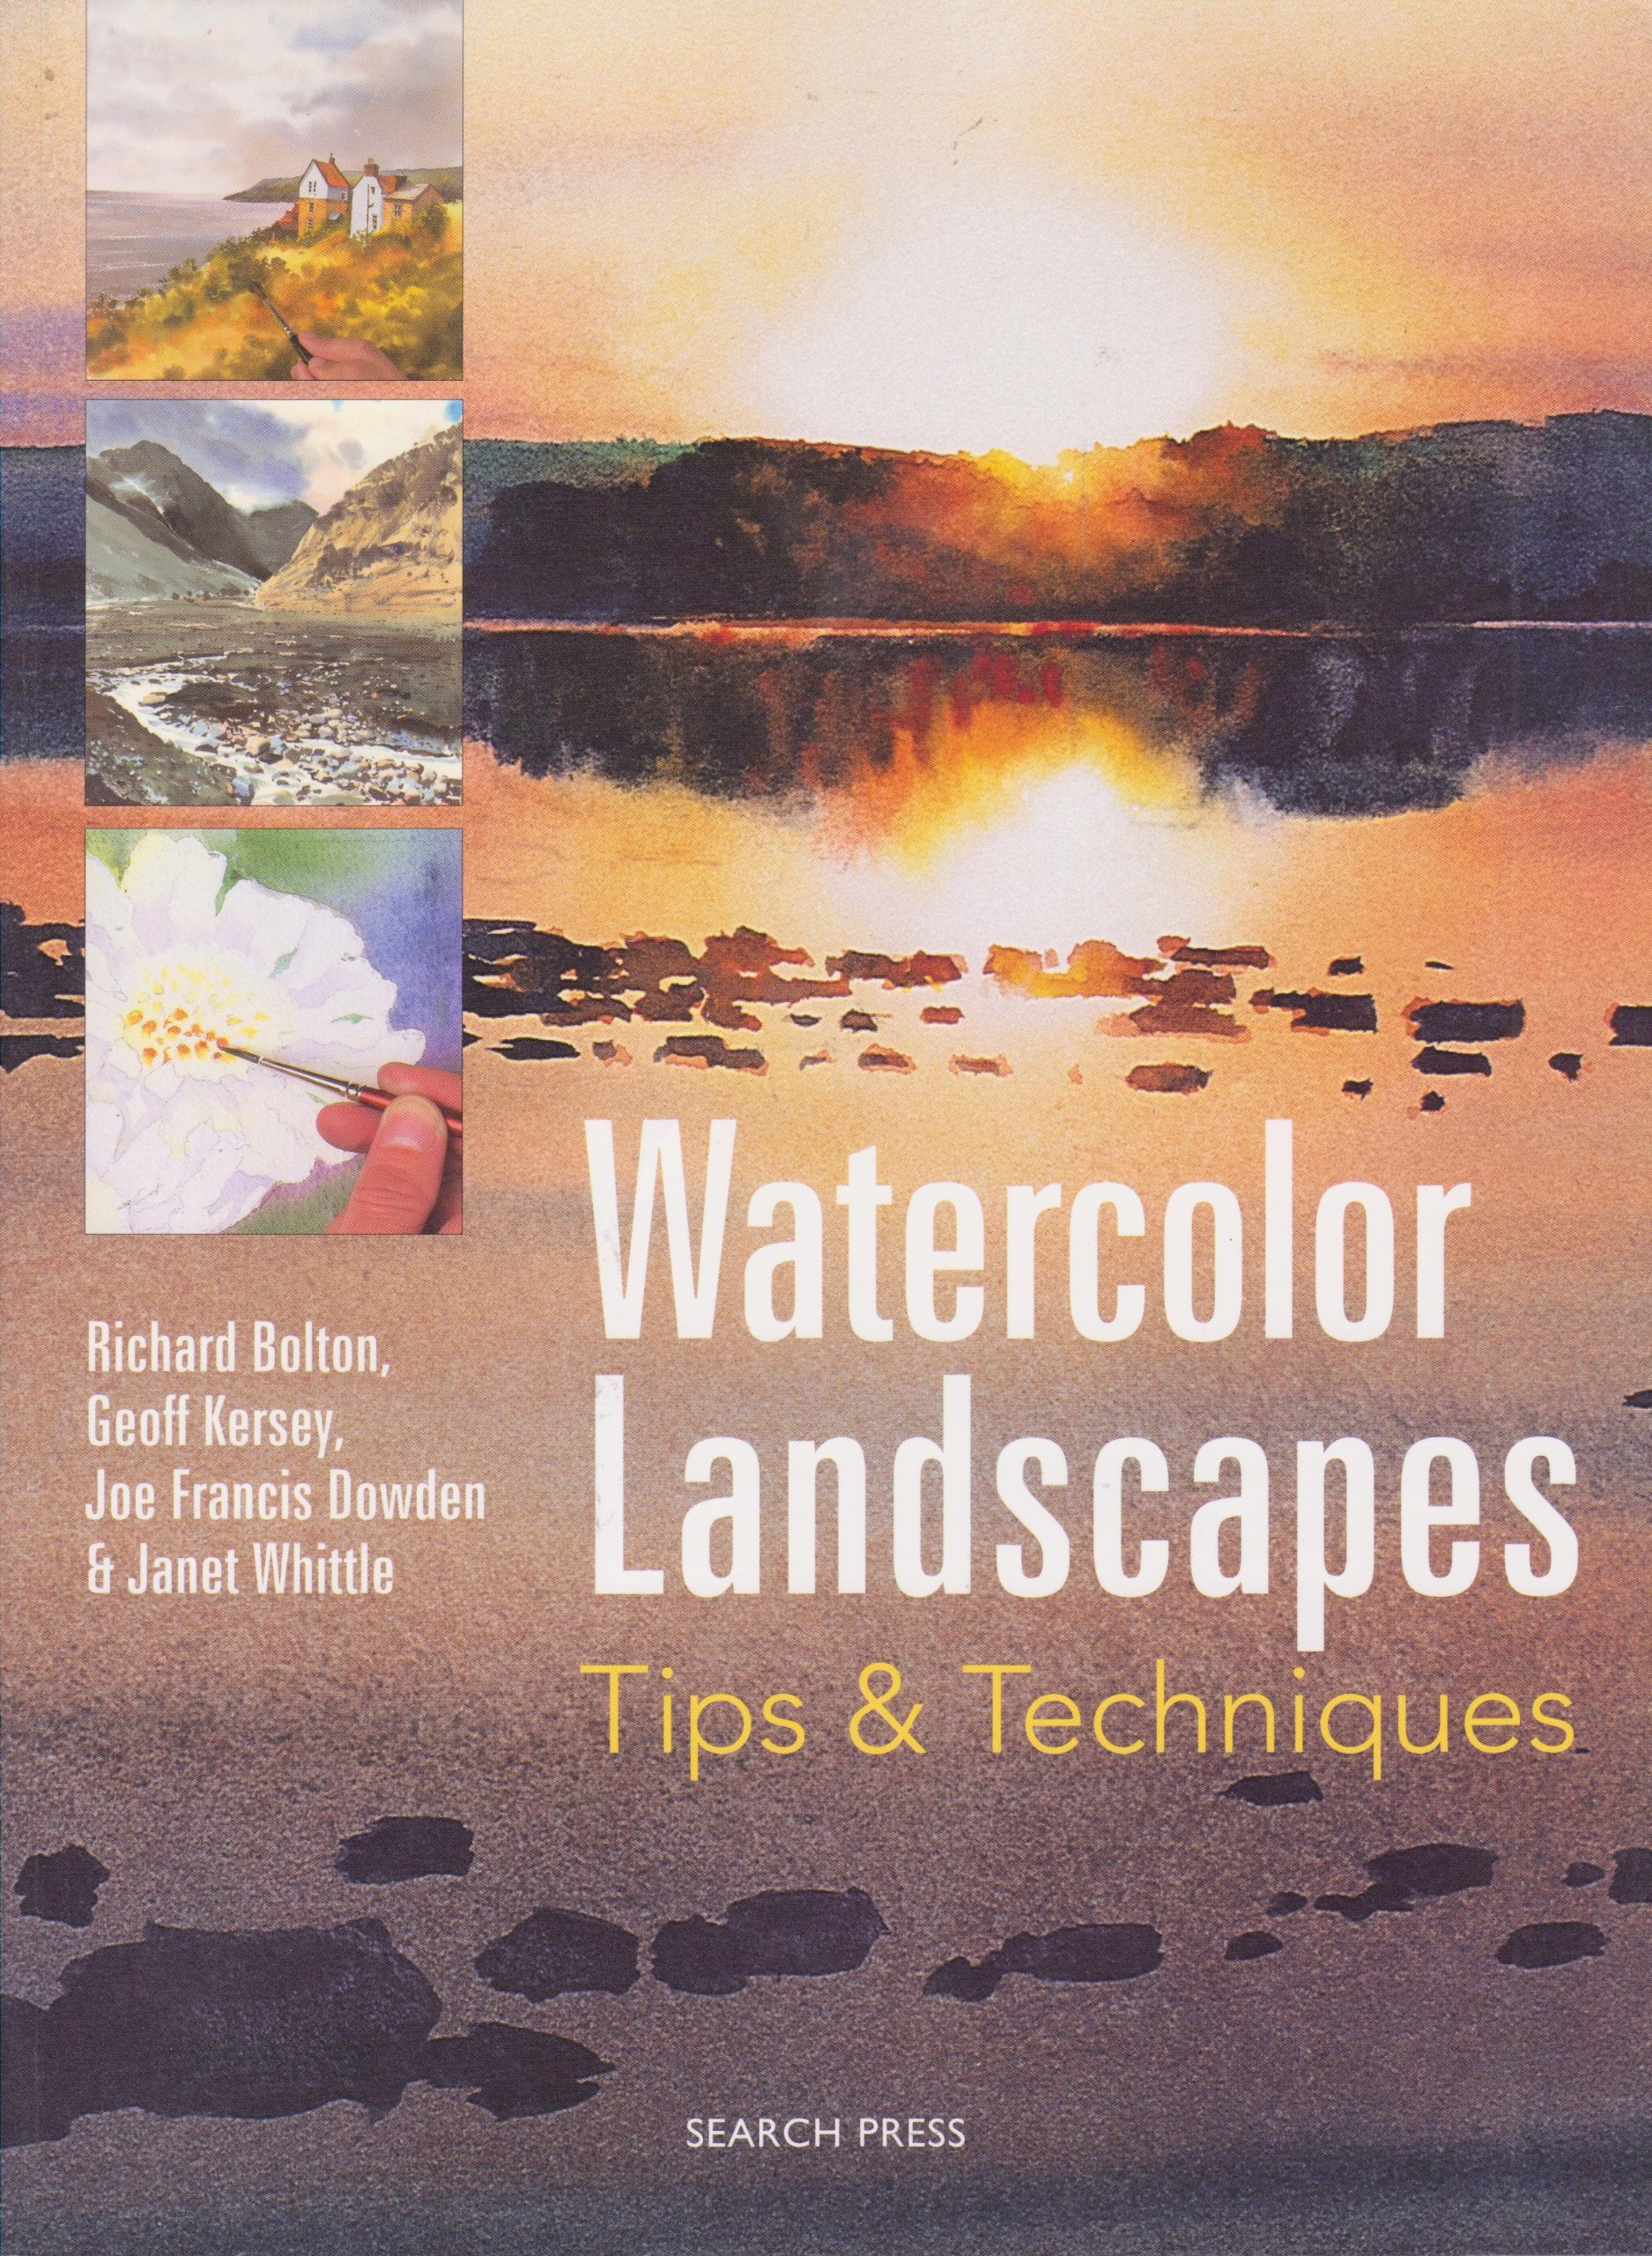 Watercolor books by search press - Watercolor Landscapes Richard Kersey Geoff Dowden Joe Francis Whittle Janet Bolton 9780681495883 Amazon Com Books